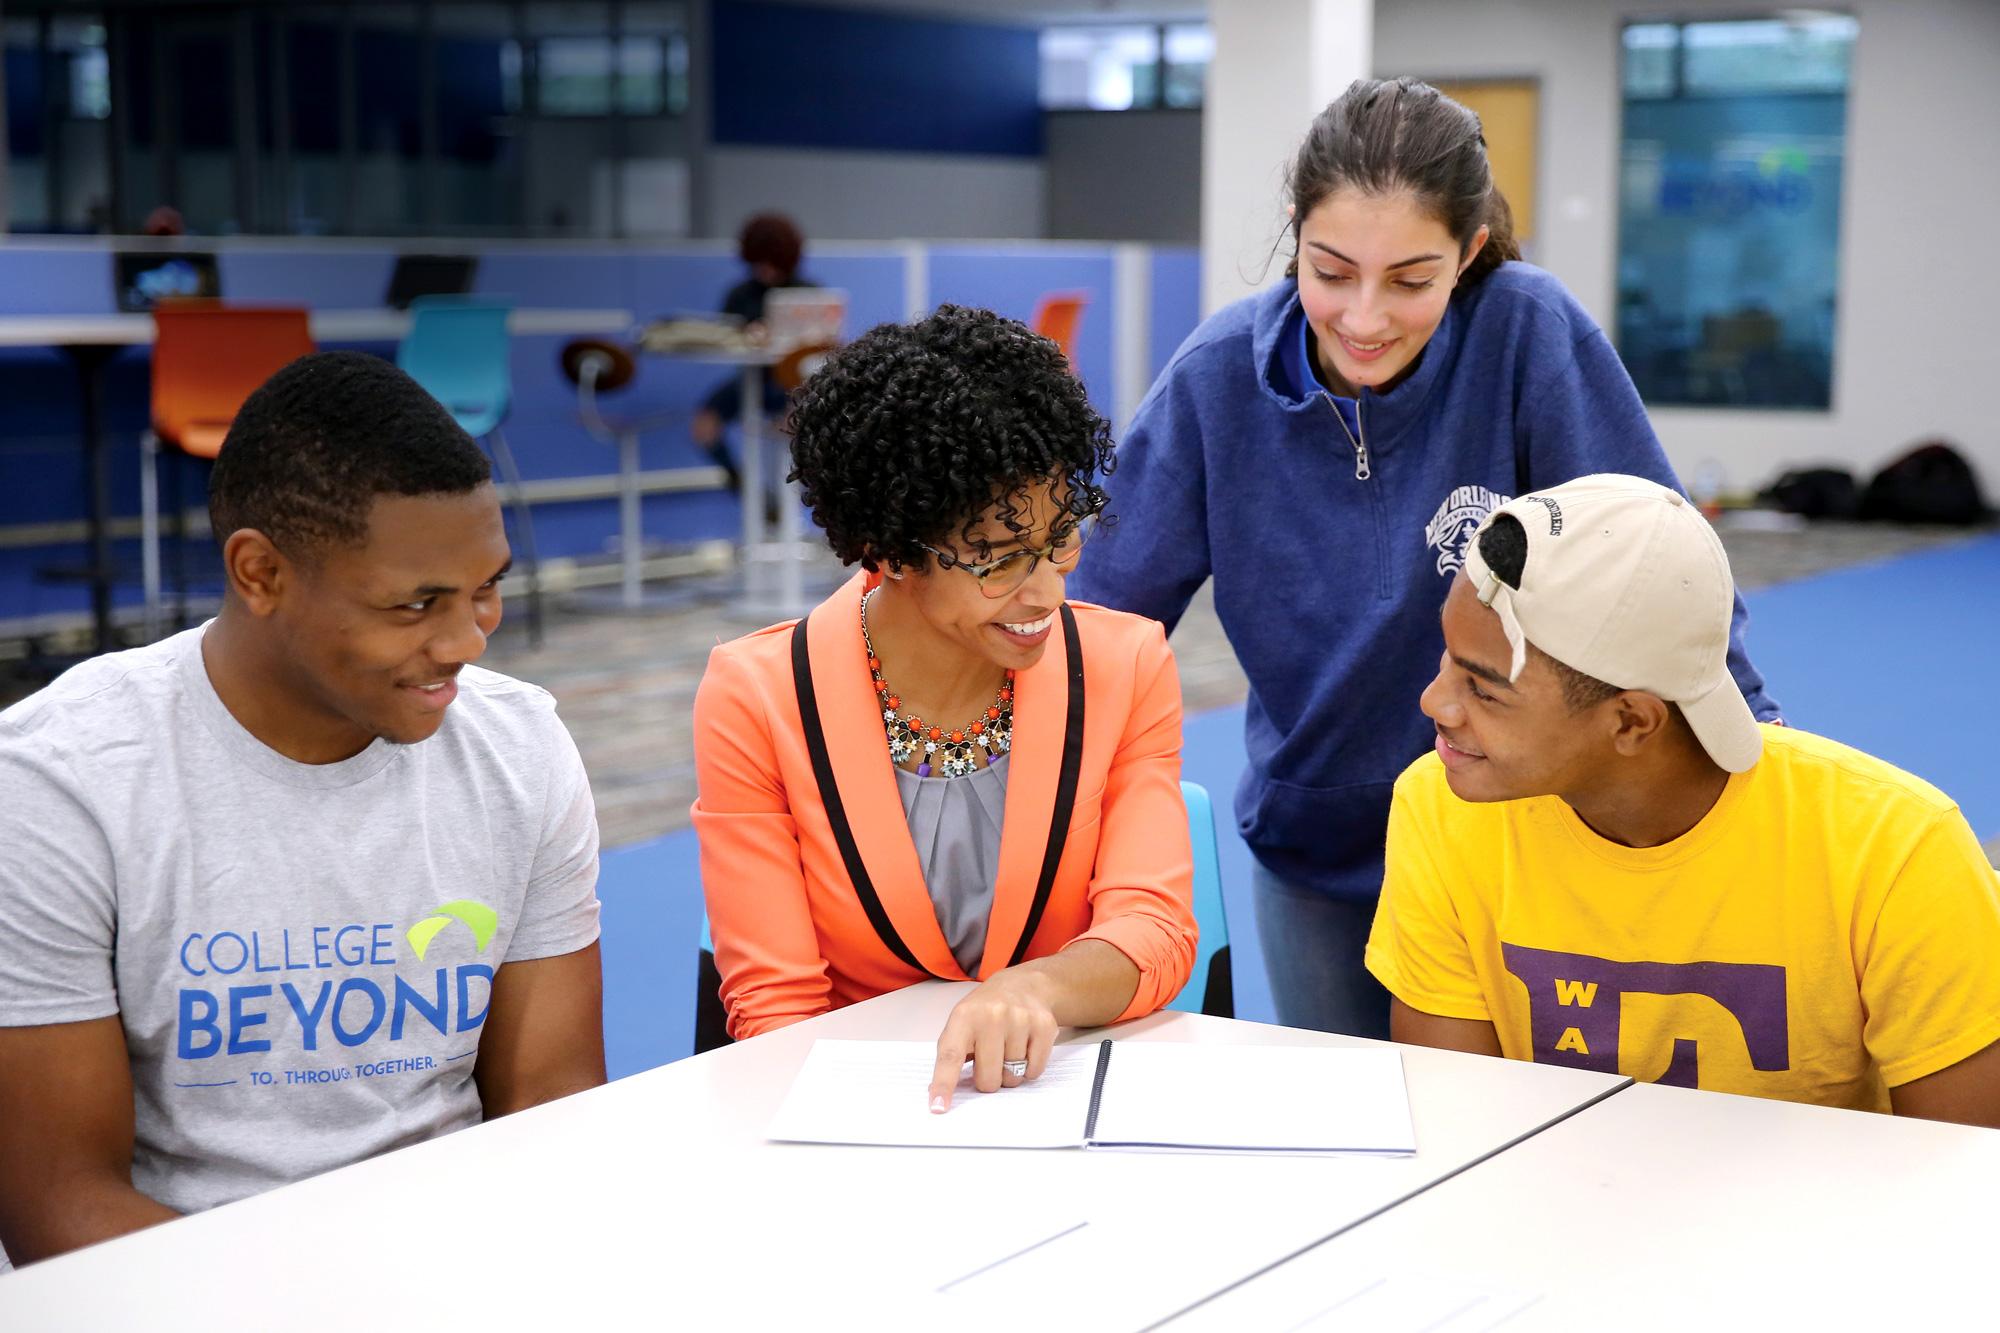 College Beyond Staff & Students